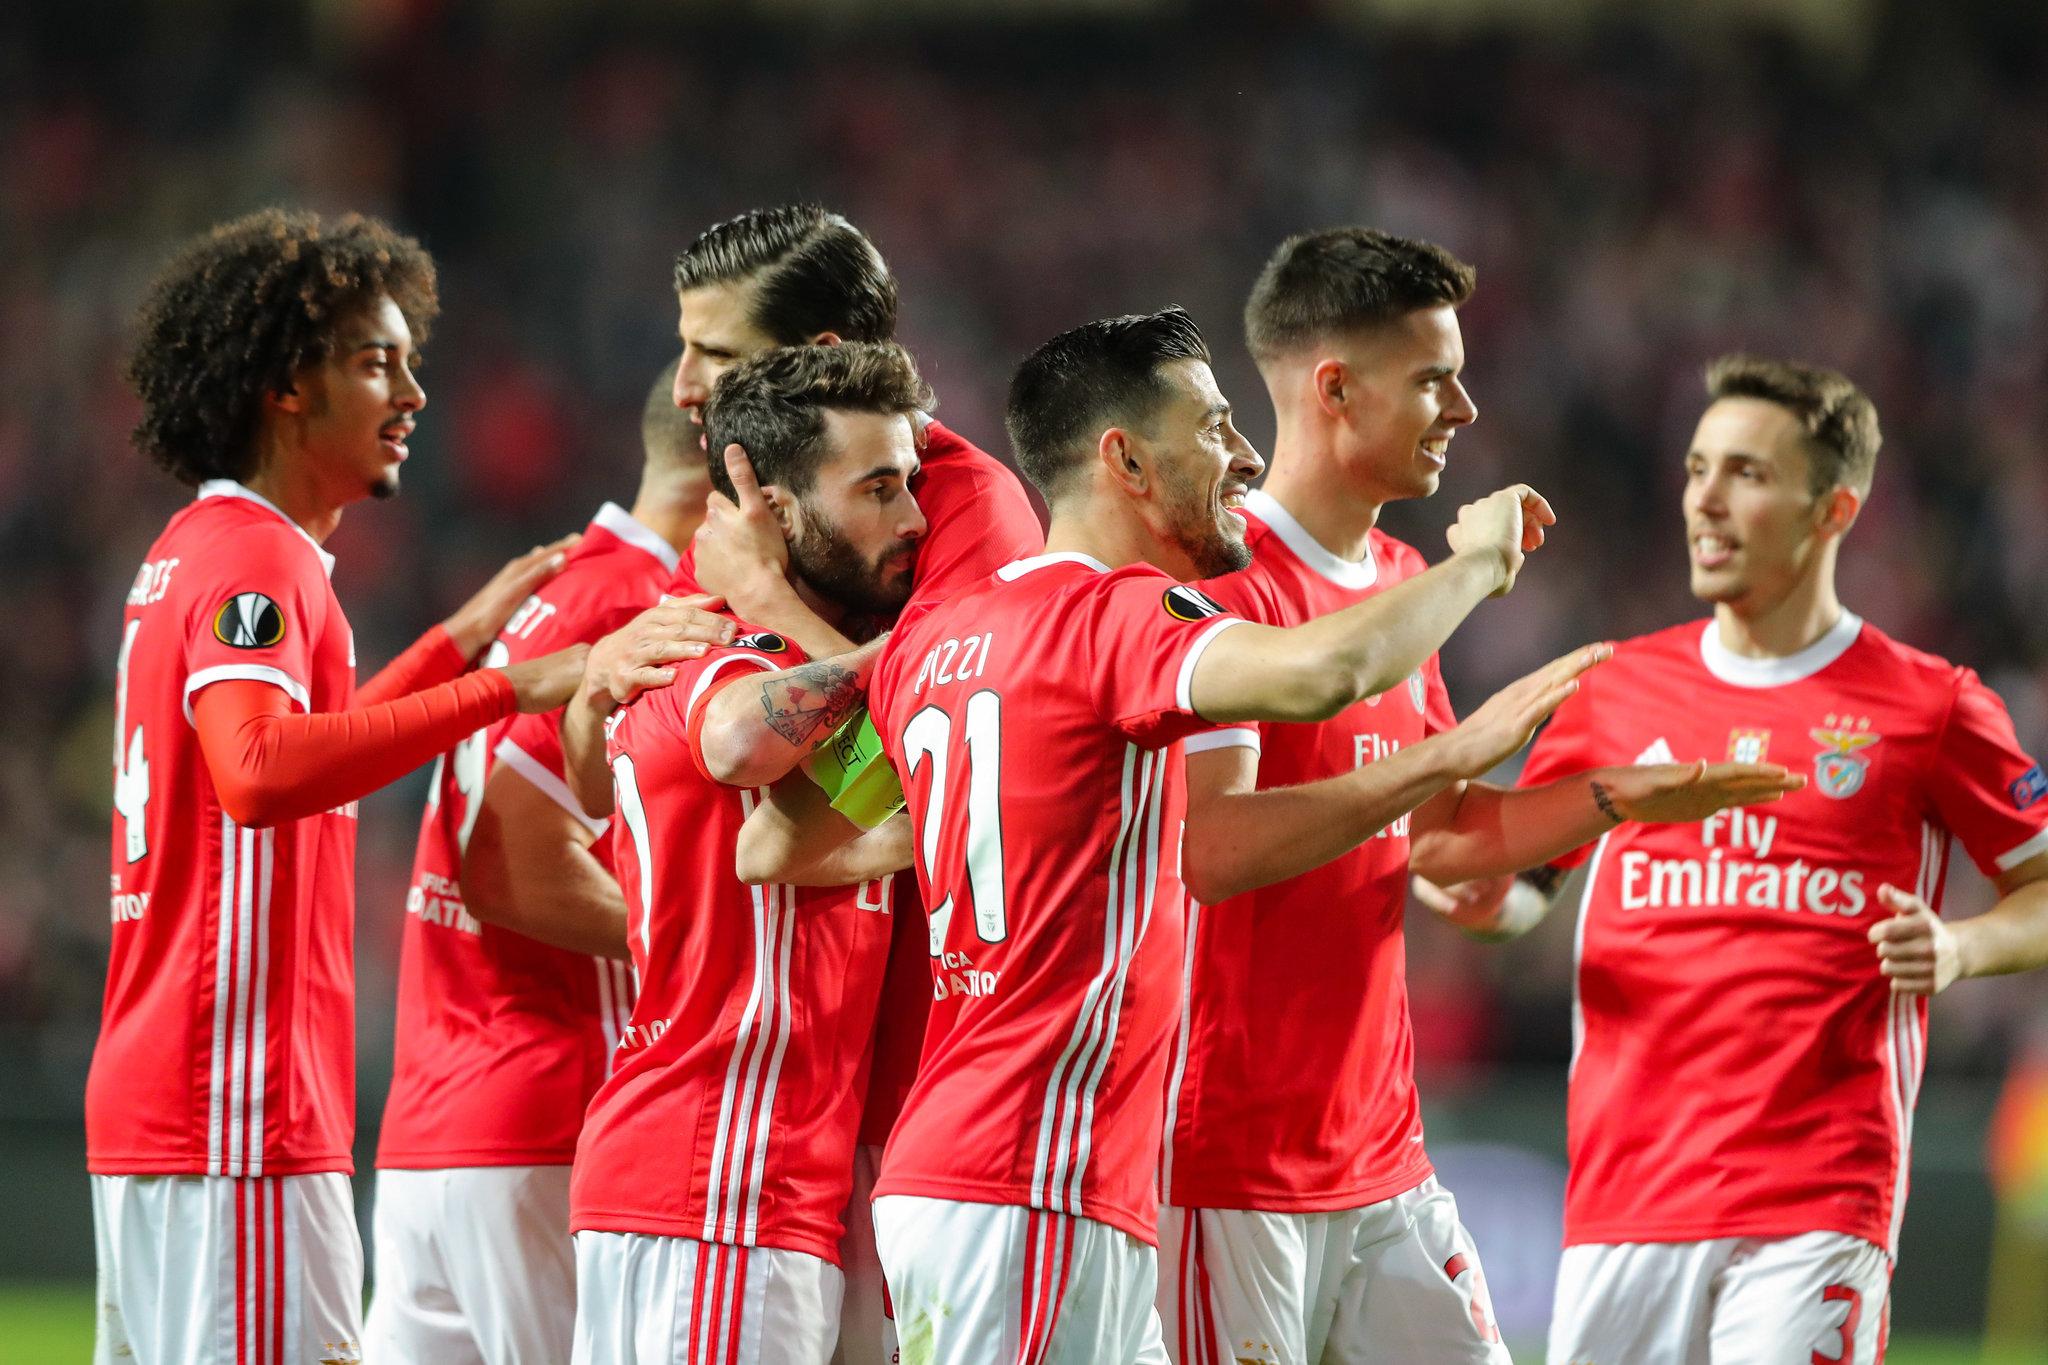 Benfica vs Barcelona: Kick-Off, Line-Up, Predictions